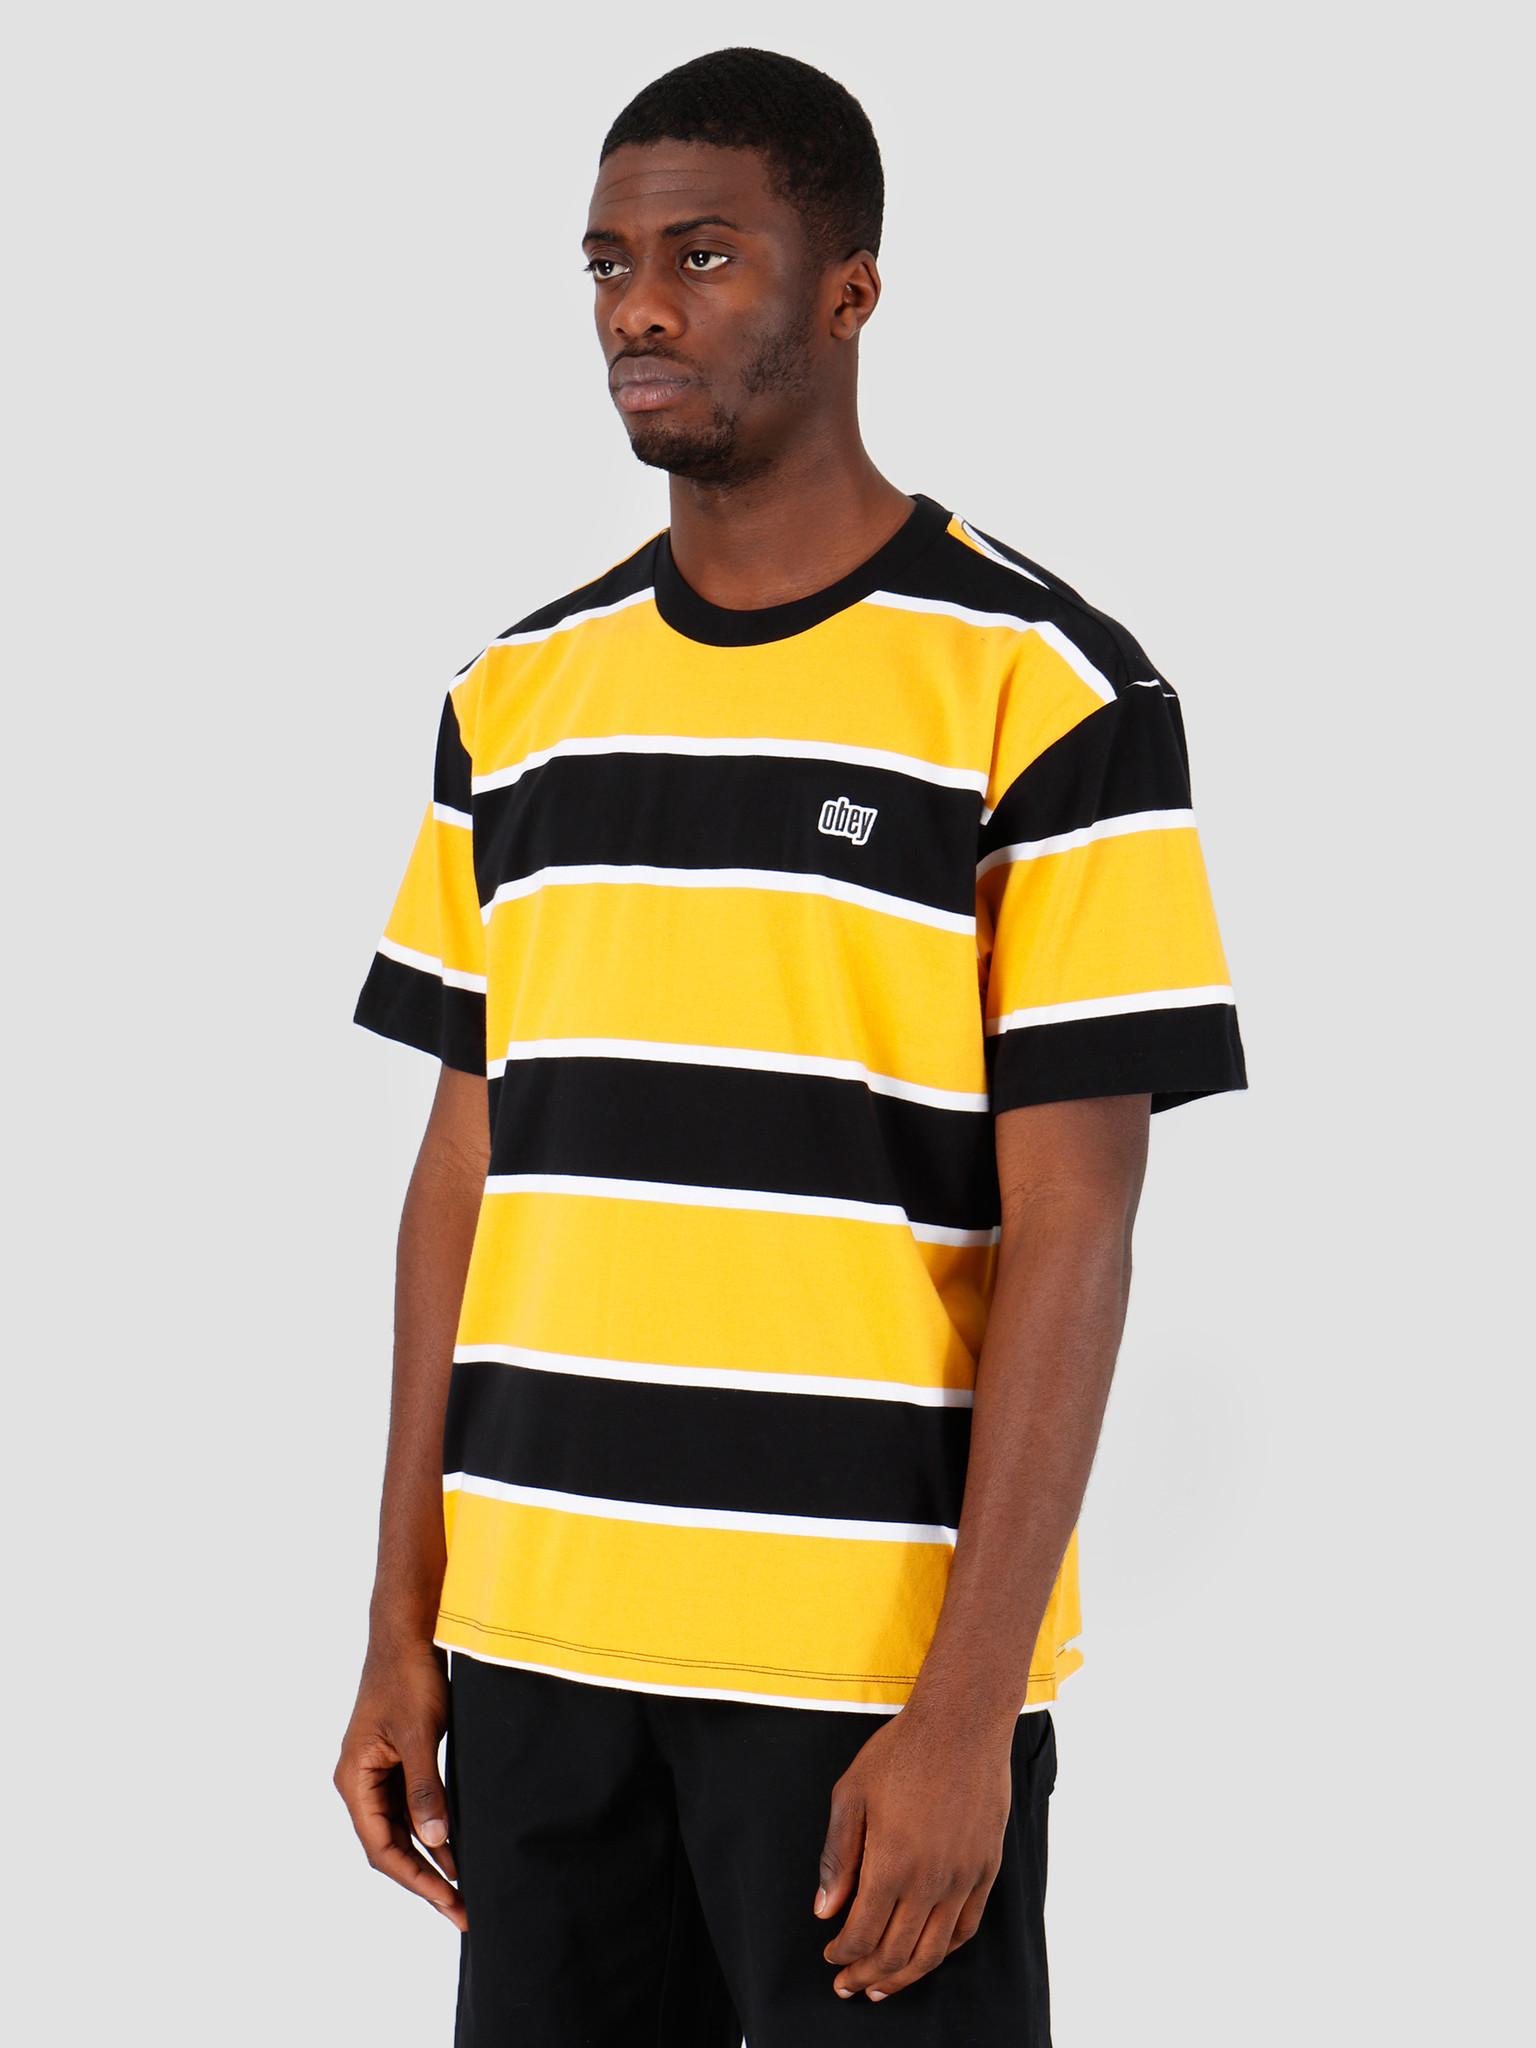 Obey Obey Acid Classic T-Shirt Black Multi 131080243-BKM